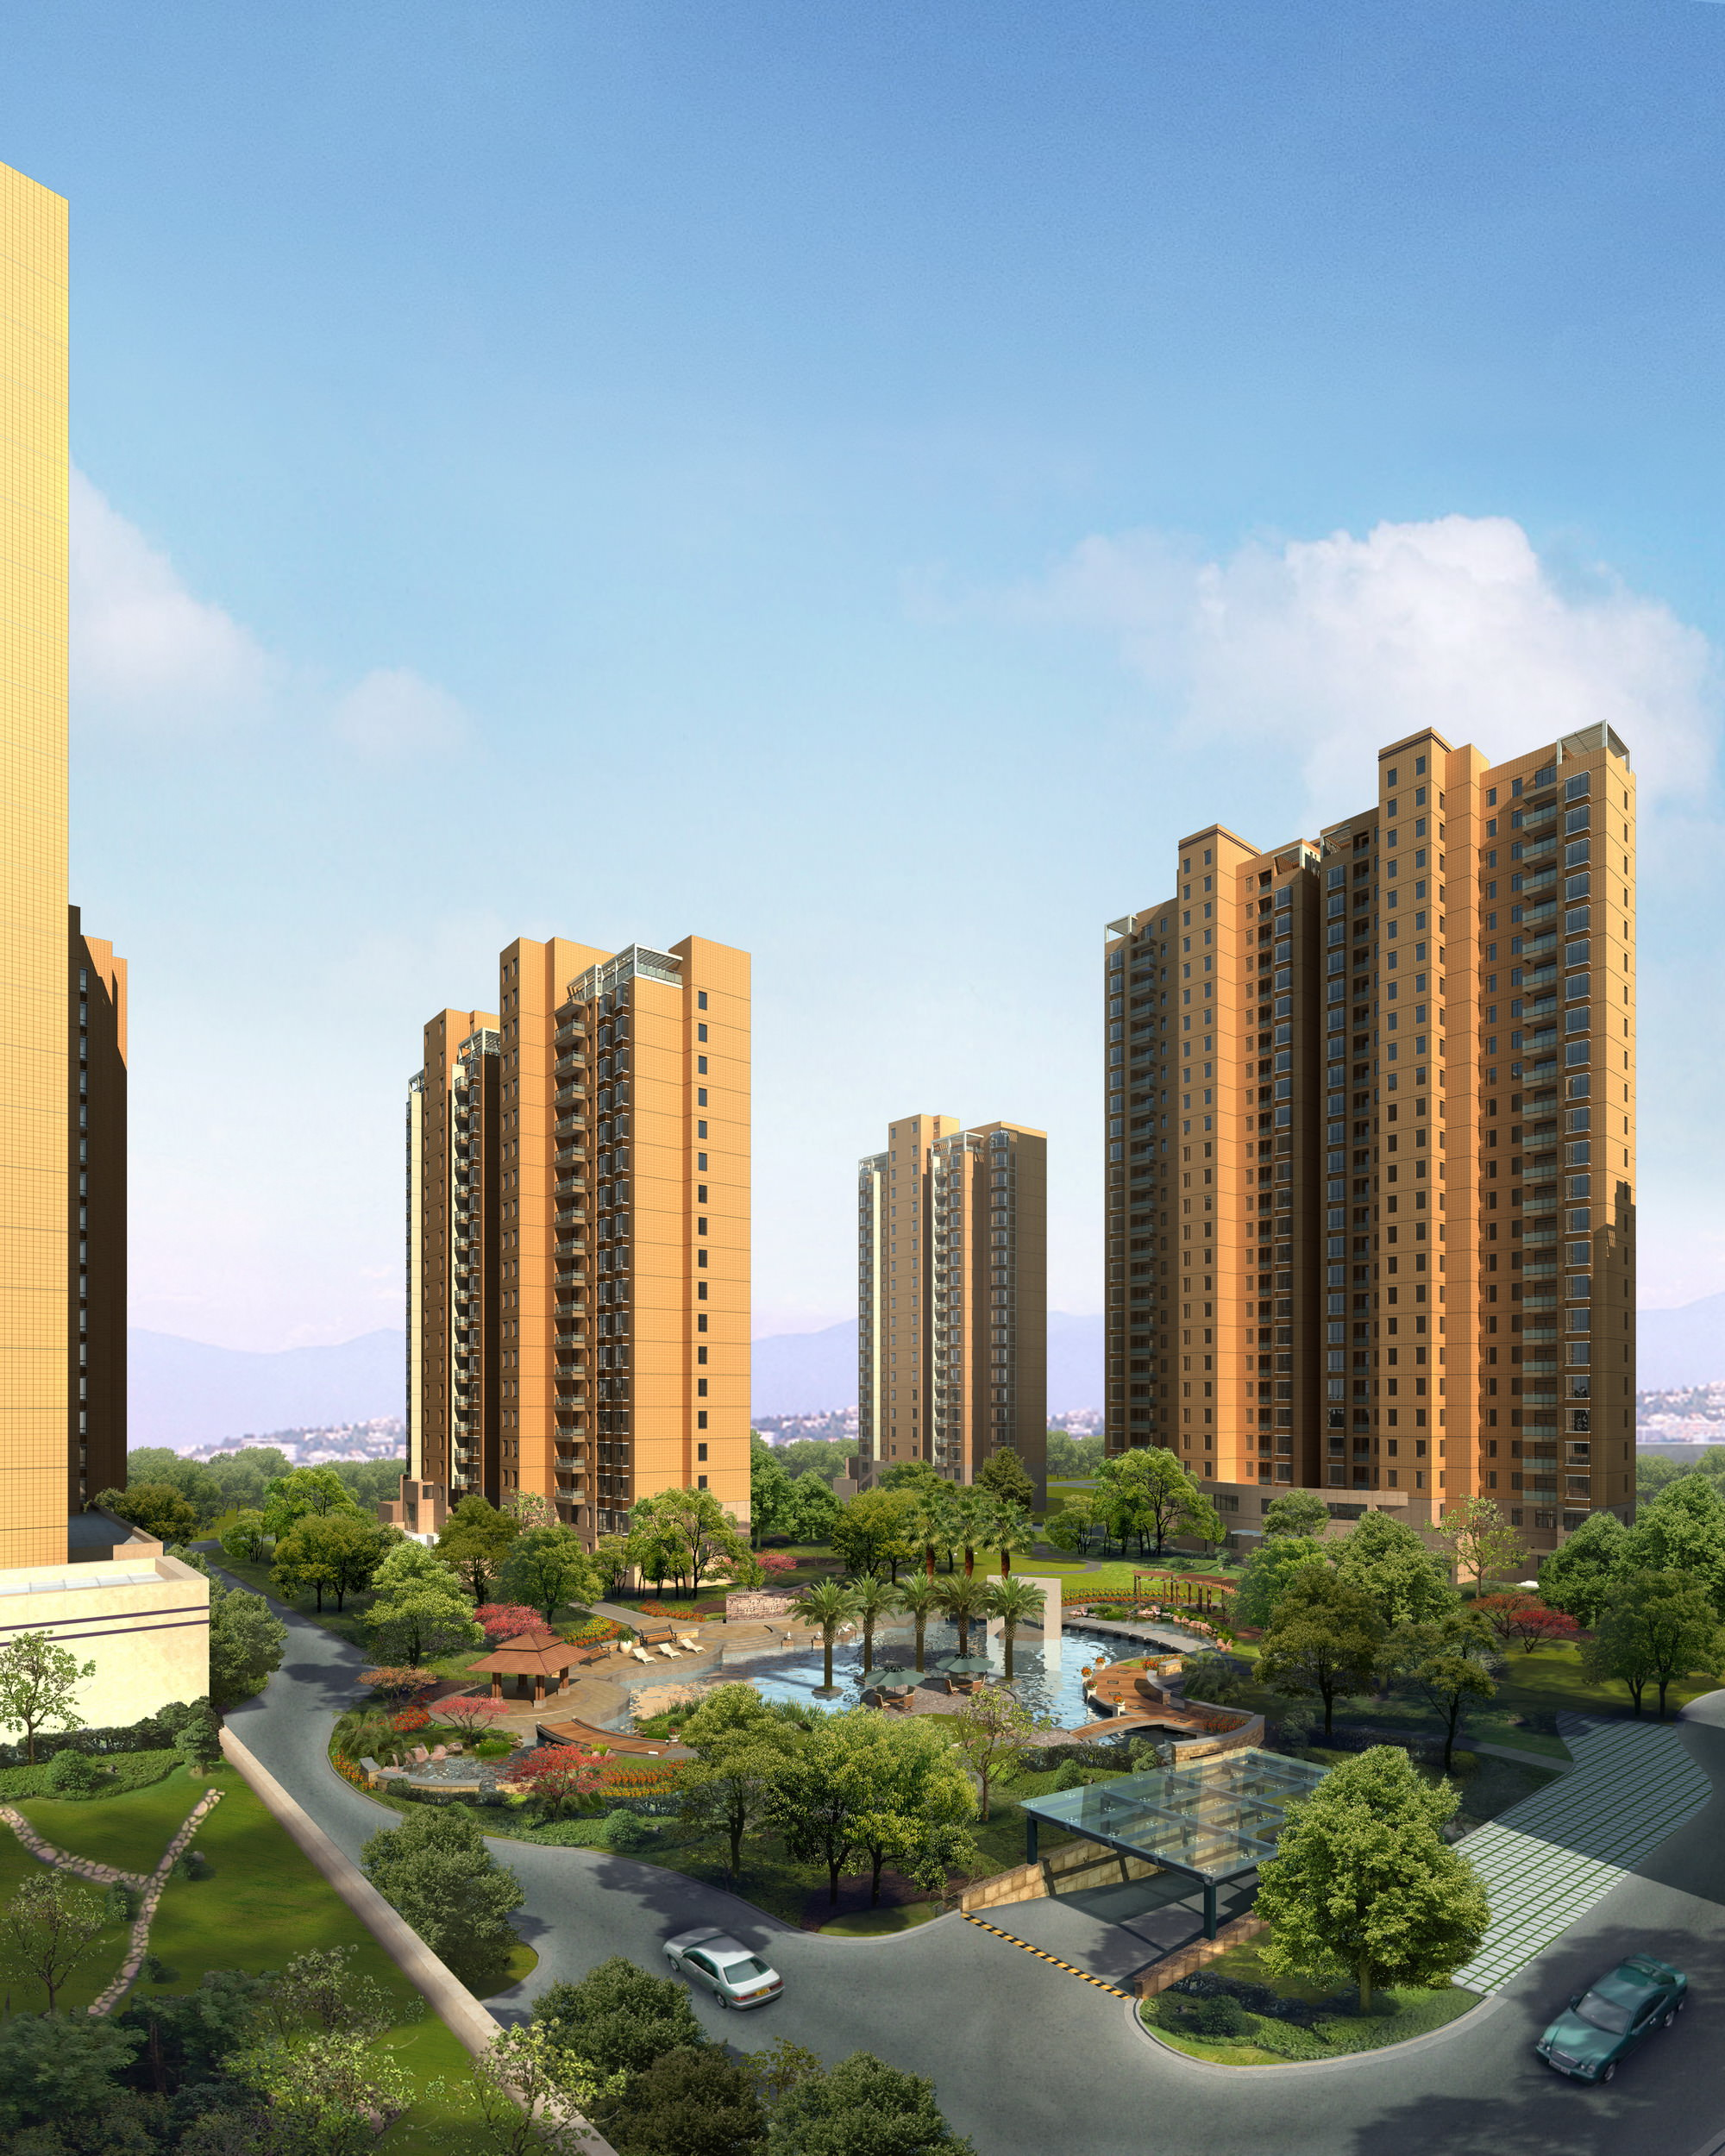 Best Exterior Design App: Multiple Buildings With Posh Exterior 3D